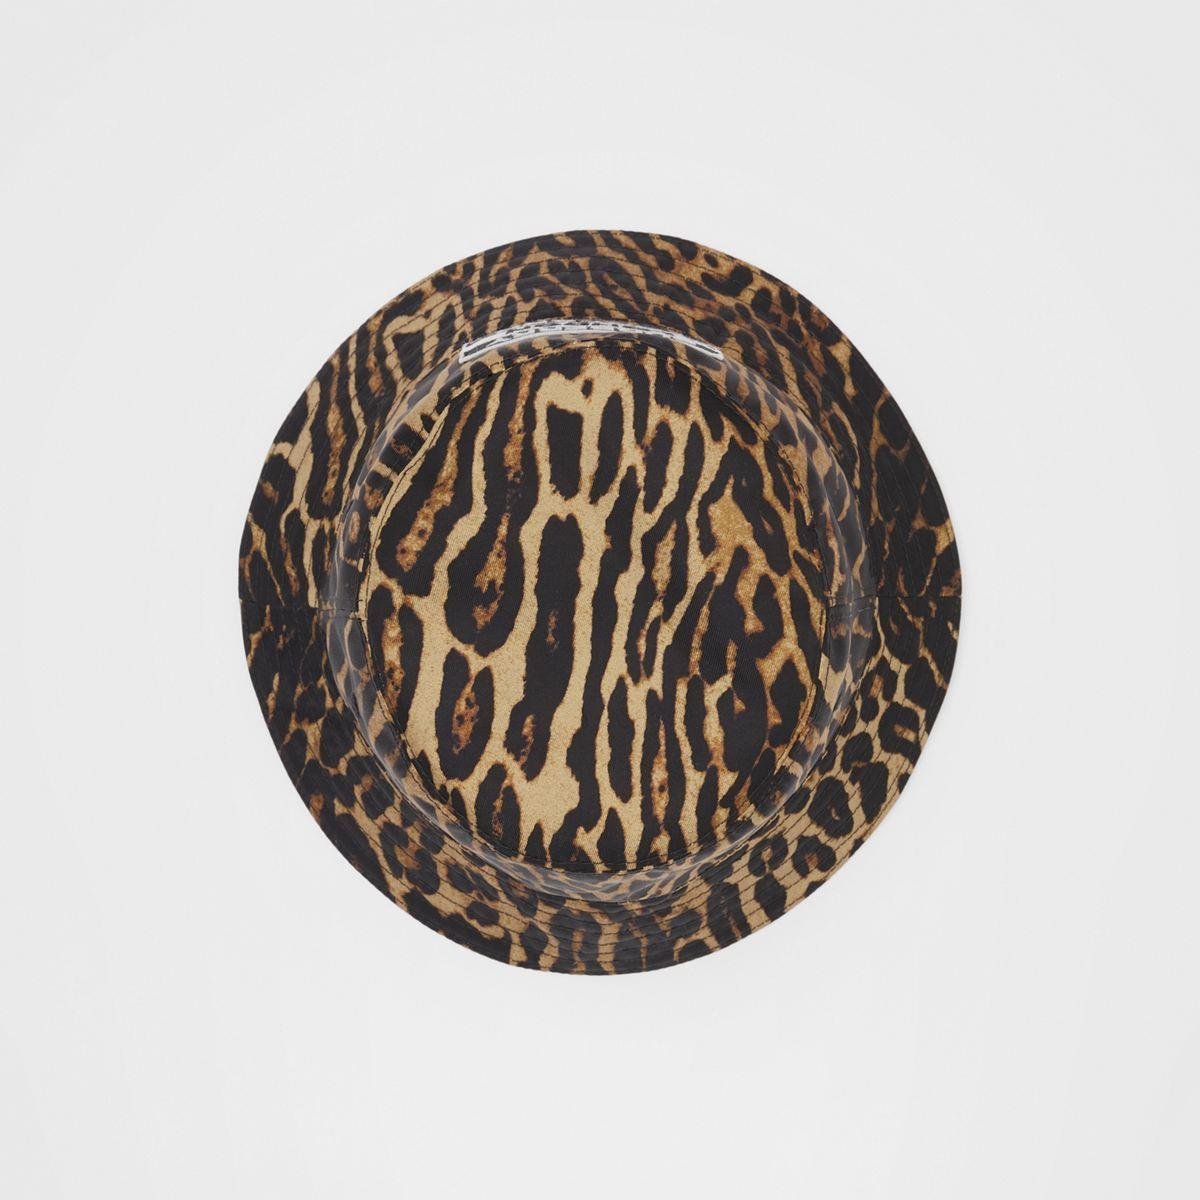 Reversible Logo Appliqué Leopard Print Bucket Hat